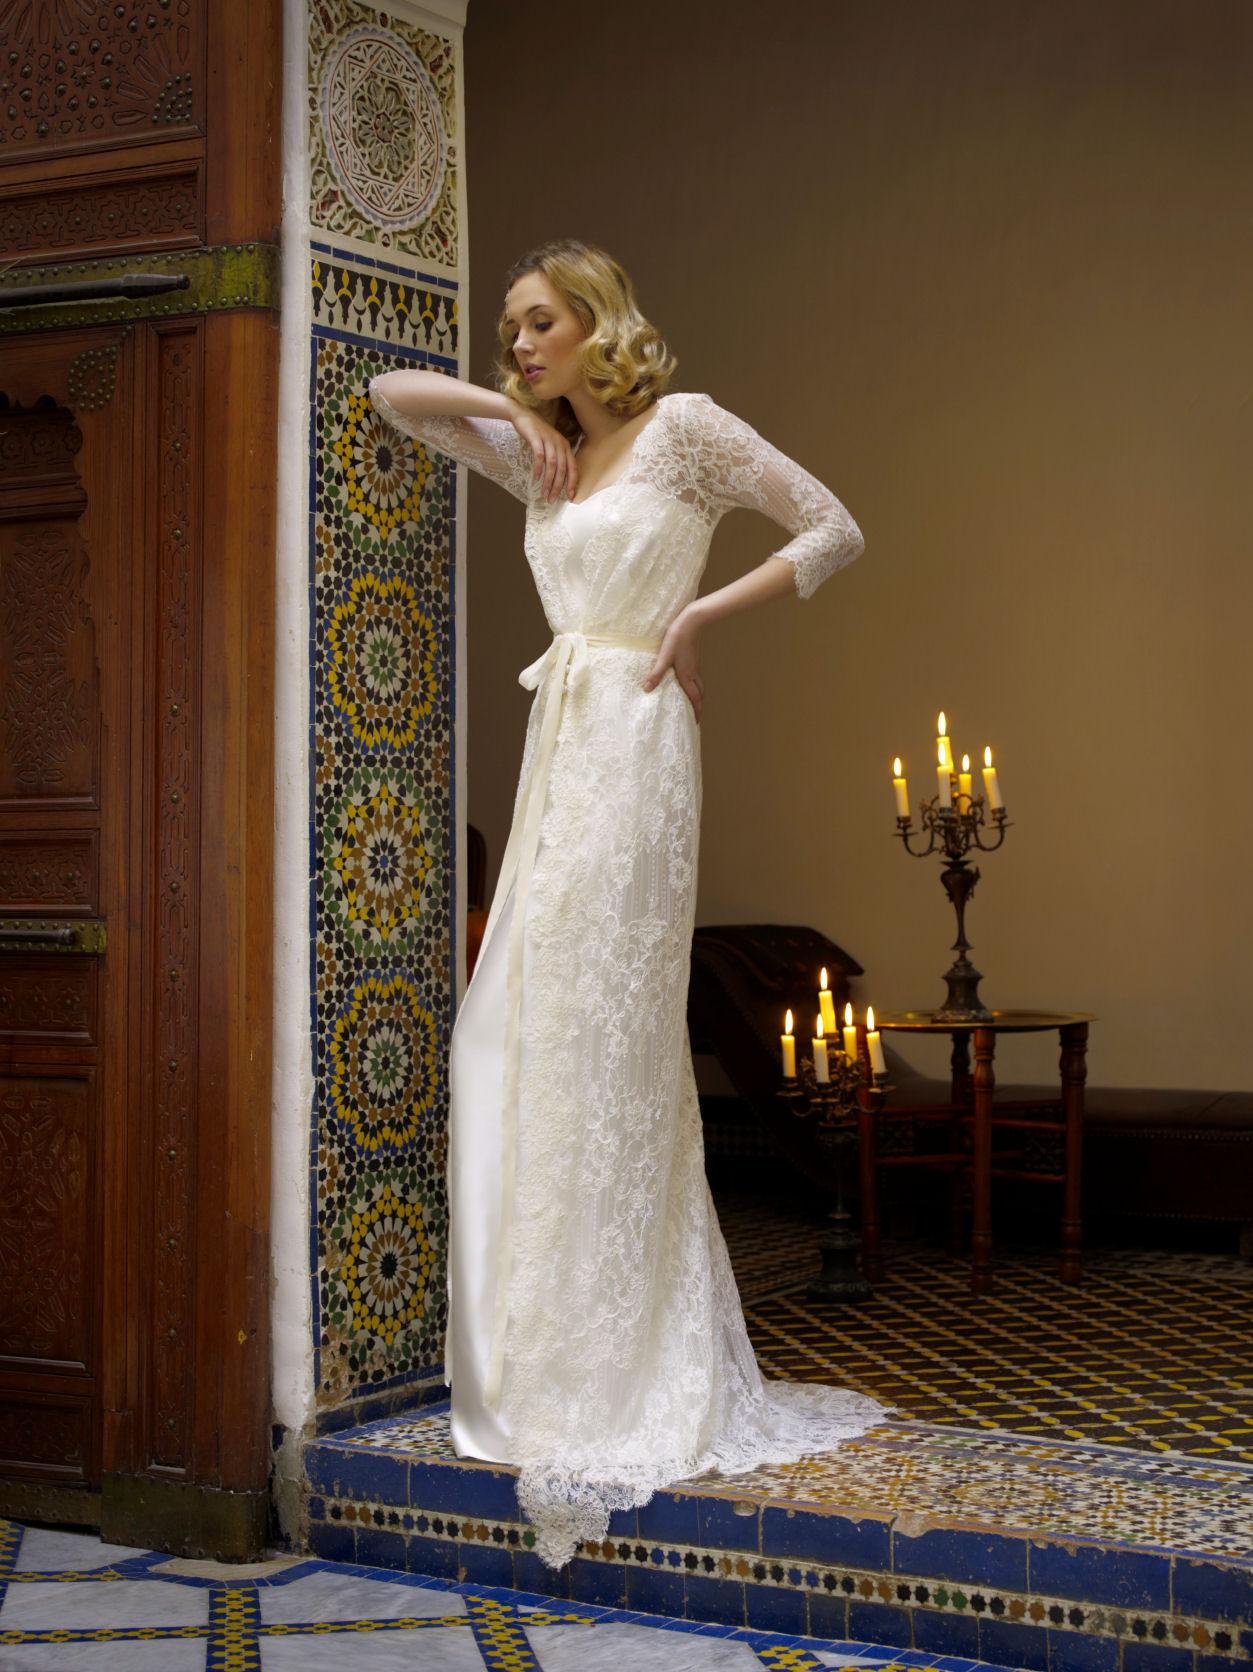 mystical wedding dresses photo - 1